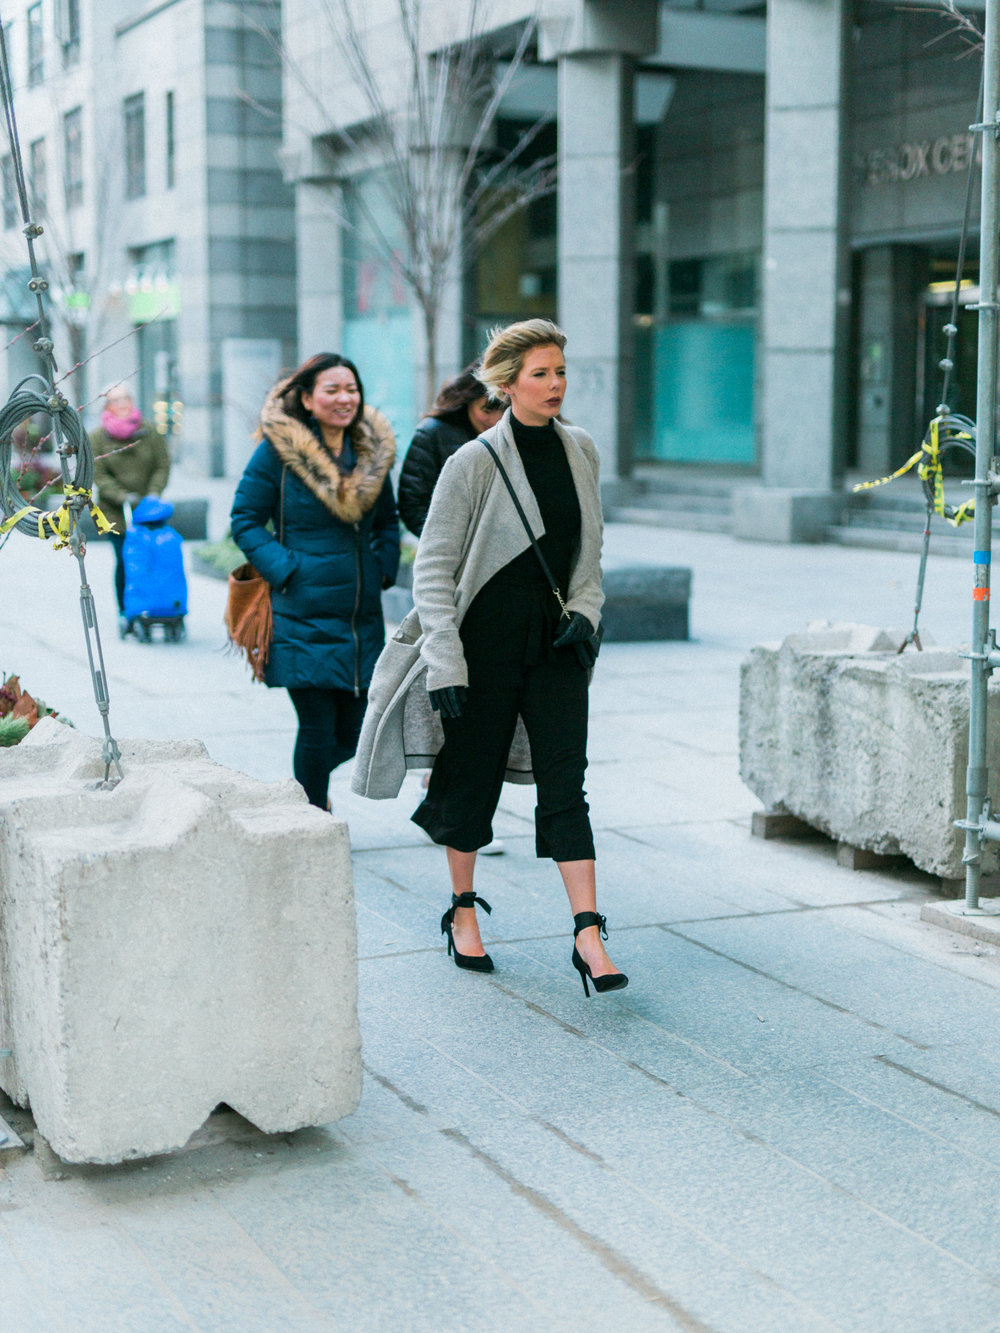 DanielleGirouxPhotography_Toronto_Portrait_StreetPhotography_0C6A1075.jpg